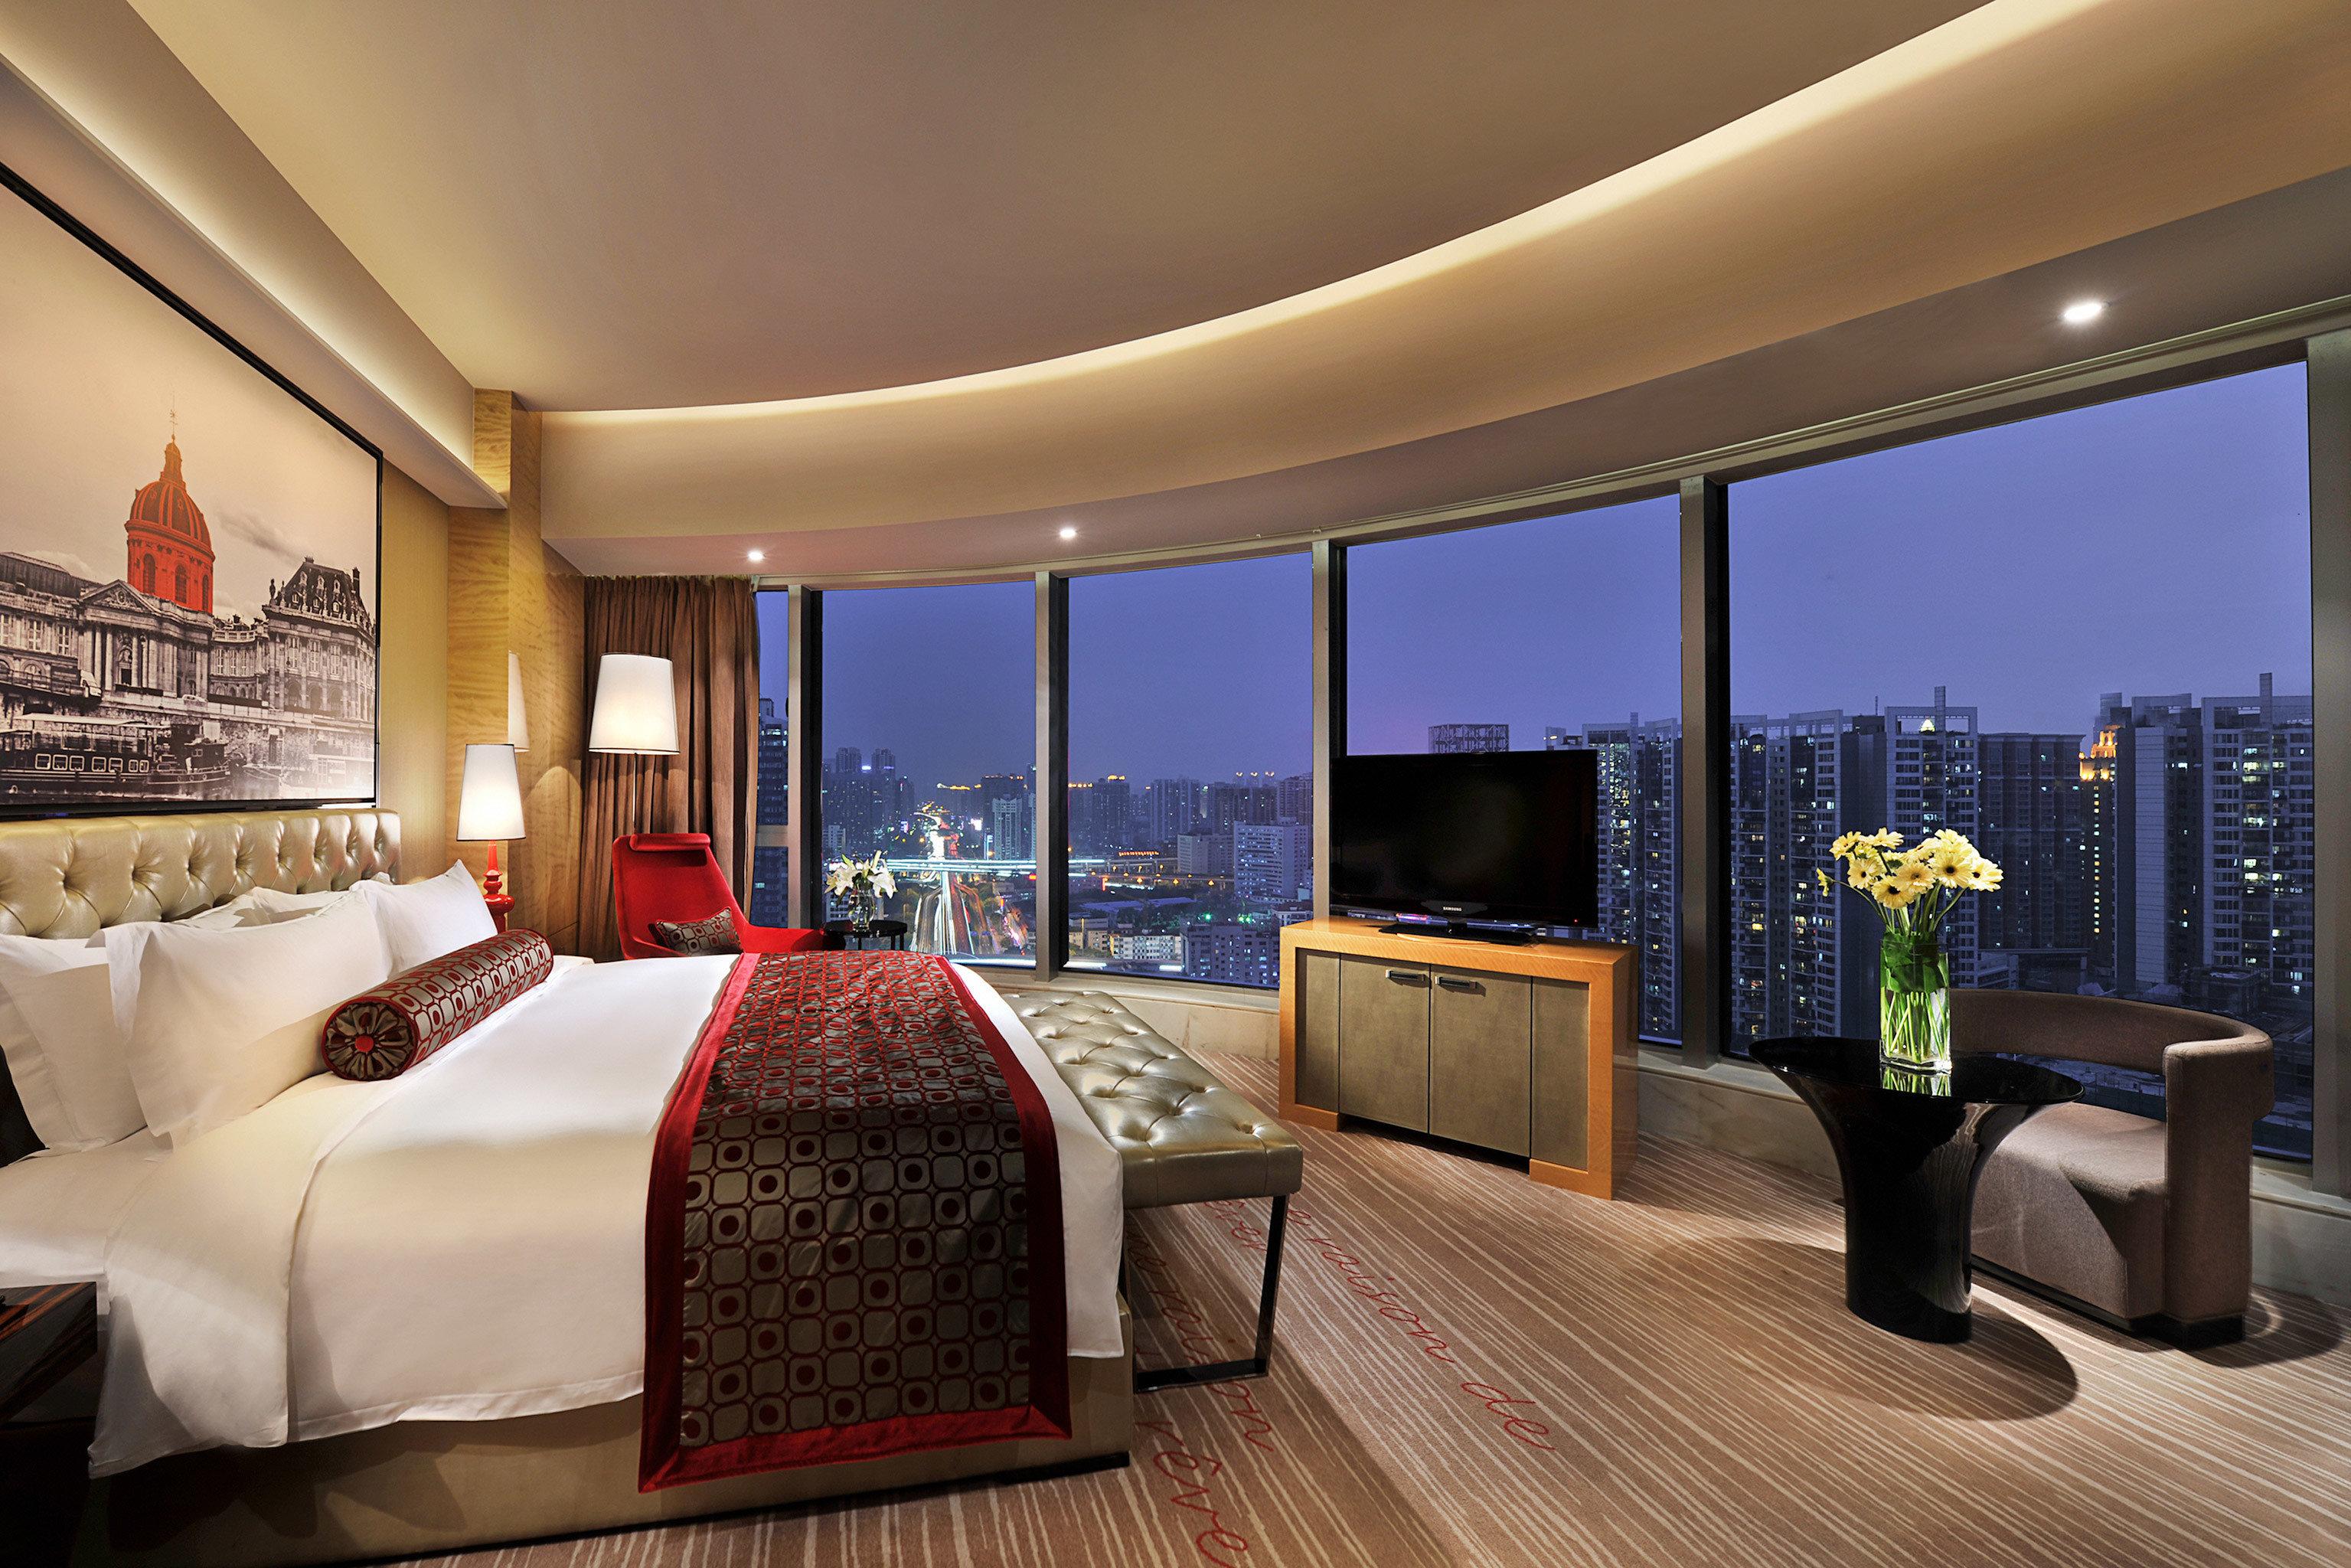 Bedroom City Classic Resort Scenic views sofa property Suite living room condominium home Lobby